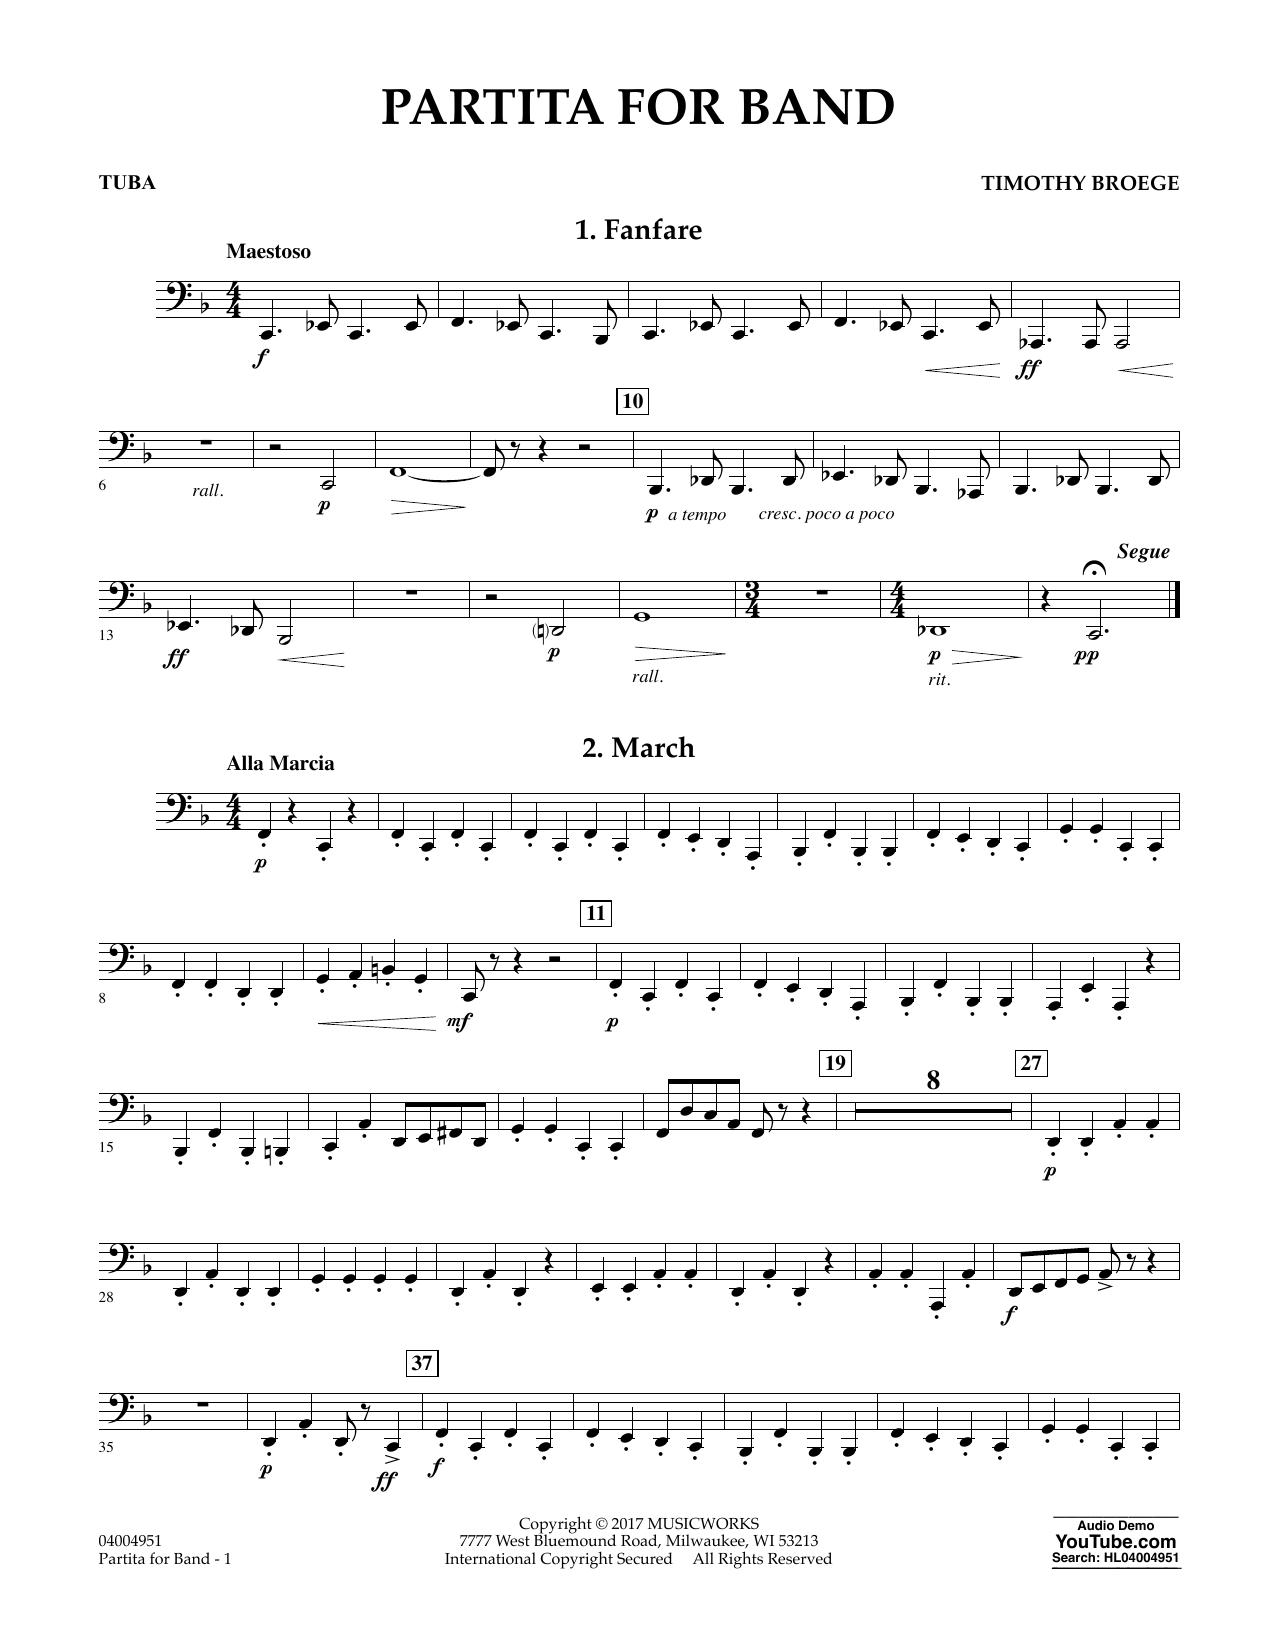 Partita for Band - Tuba Sheet Music